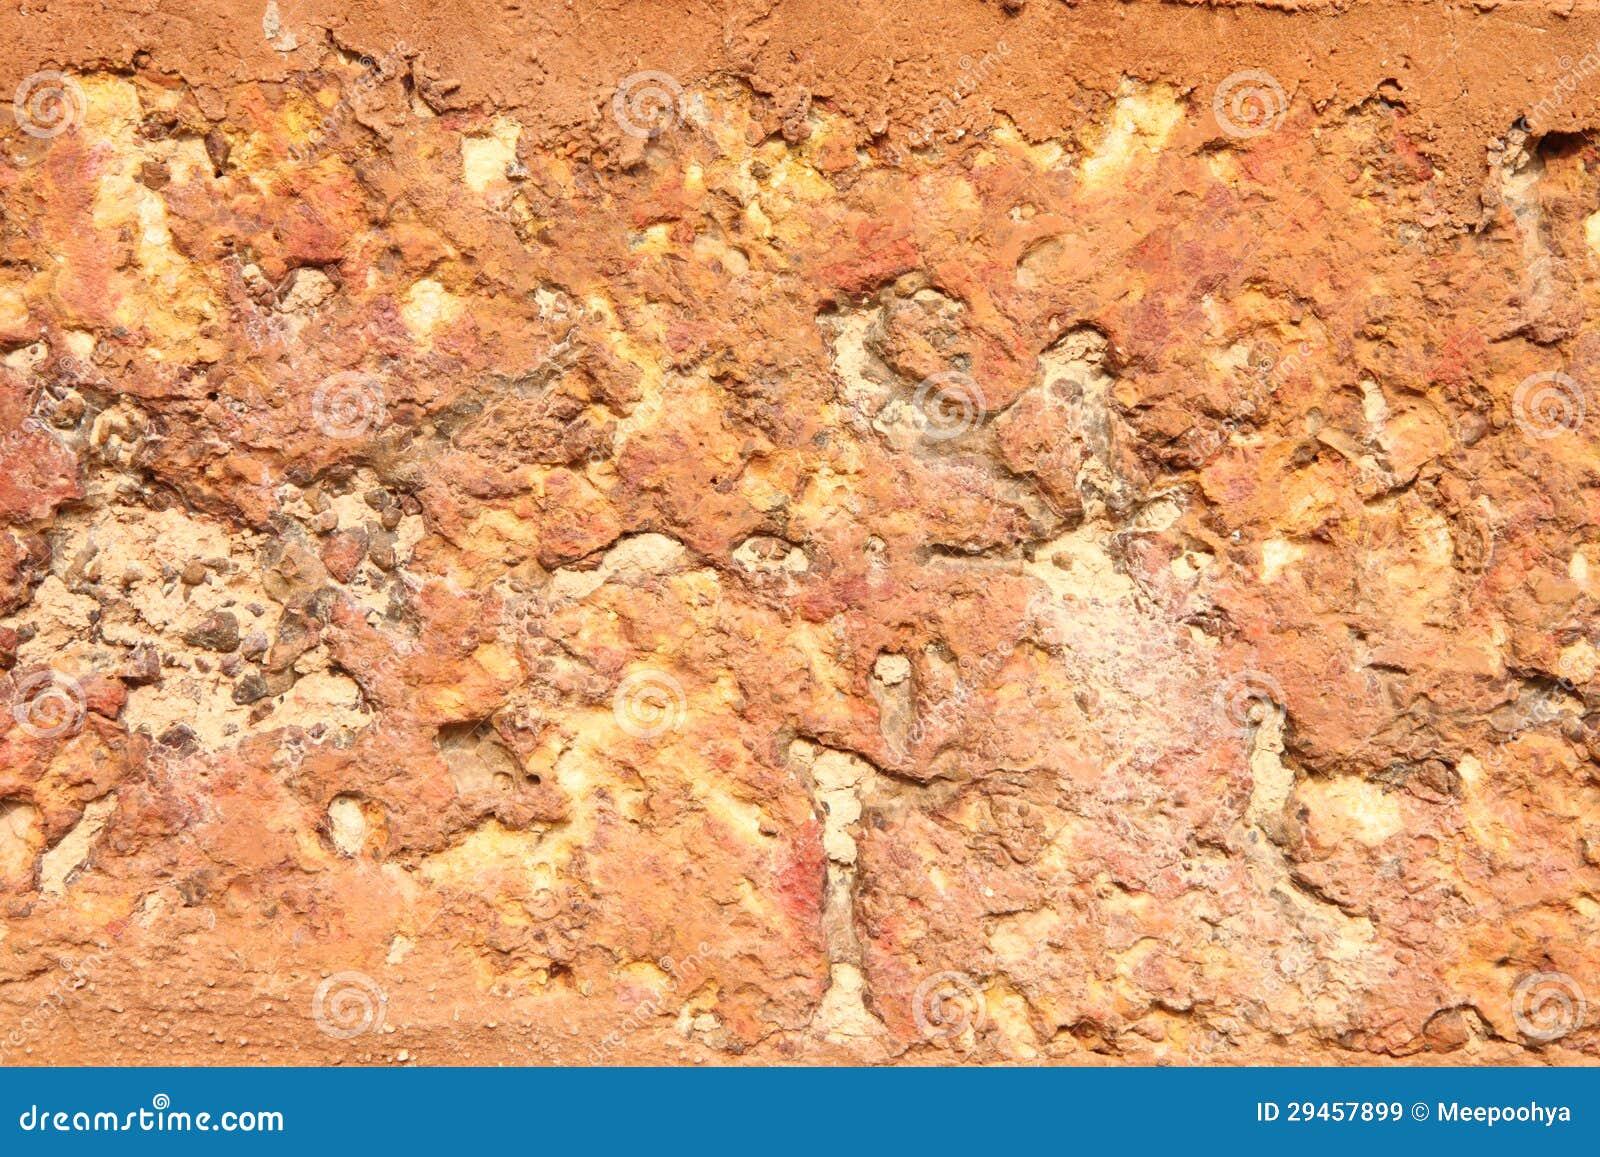 Red Granite Boulder : Red stone boulder royalty free stock images image